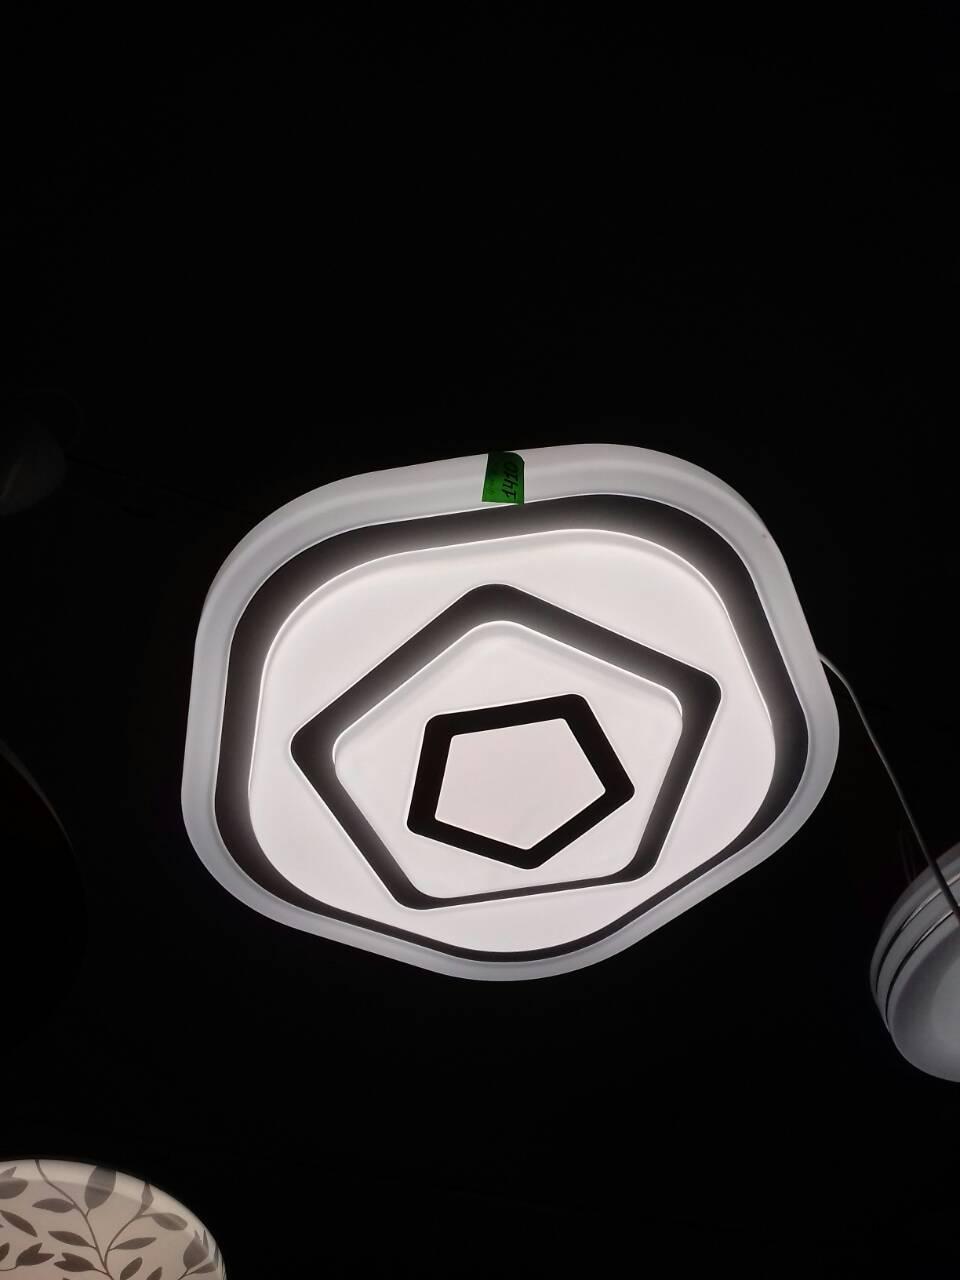 LED Светильник SMART Люстра MIRAGE 70W 49 см диаметр